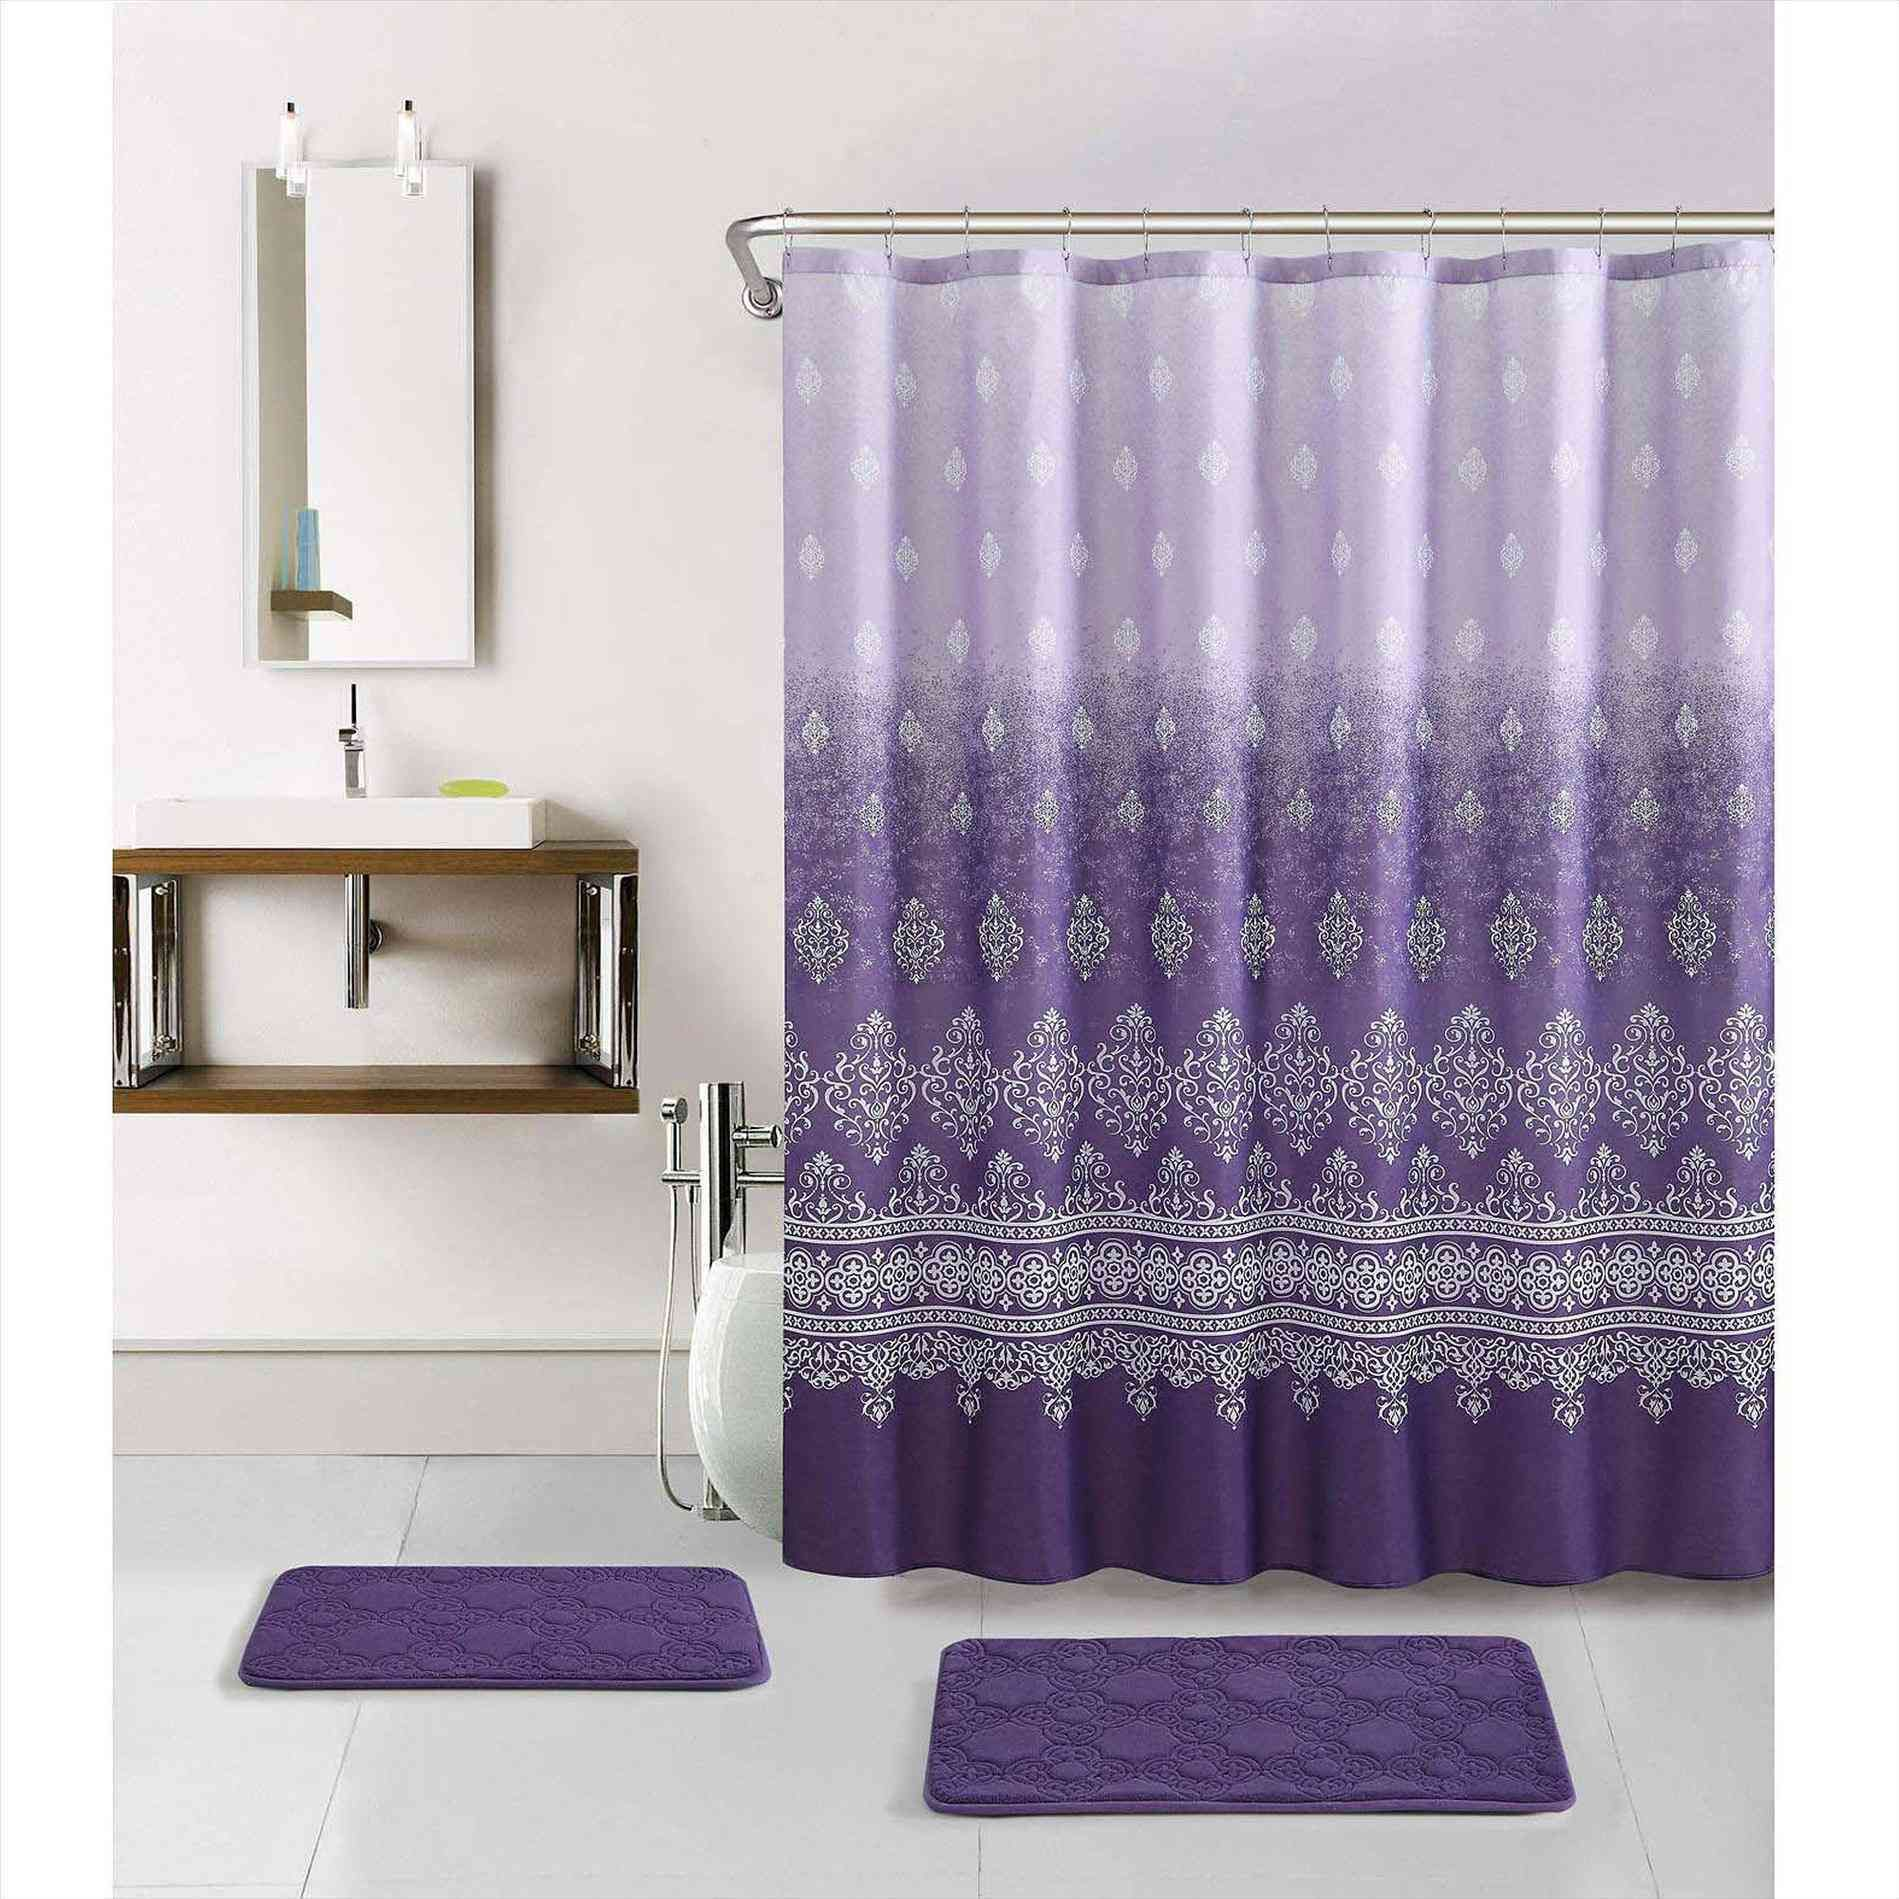 New Post purple bathroom accessories sets LivingRooms